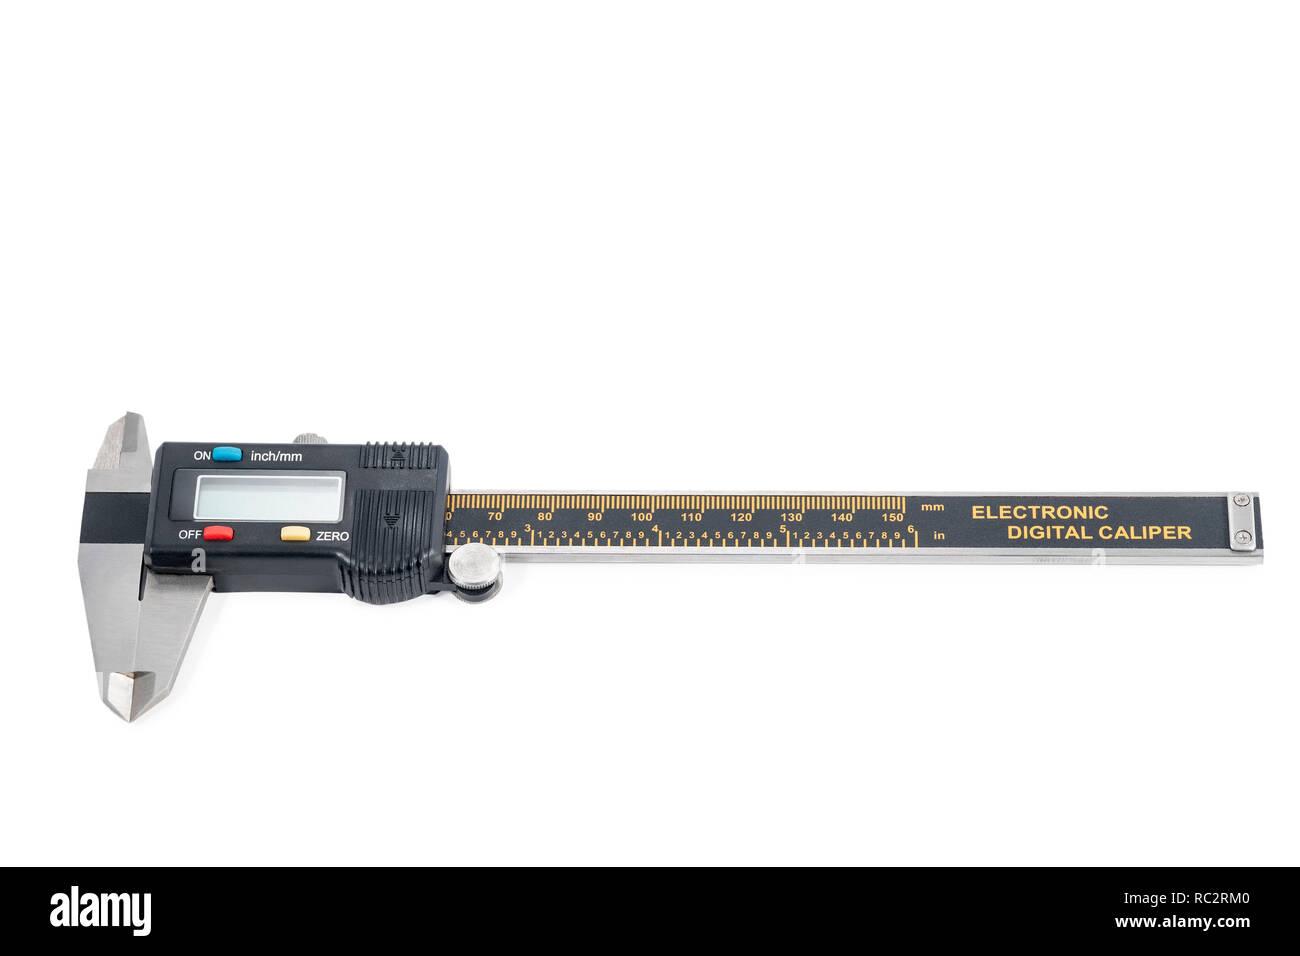 electronic digital caliper - Stock Image